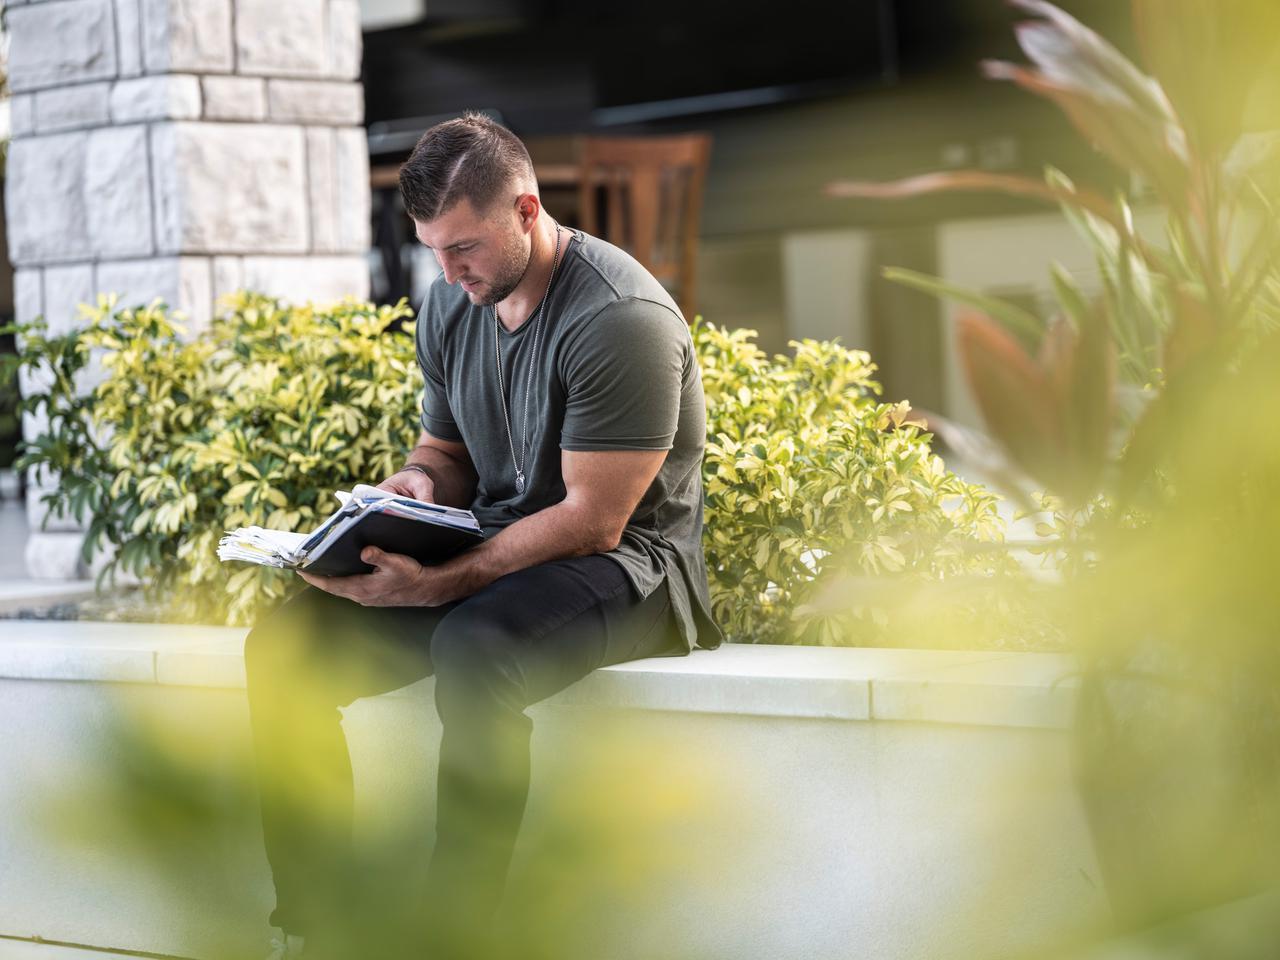 Spending Time in God's Word... Model: Tim Tebow    Photo Credit: Grit Media